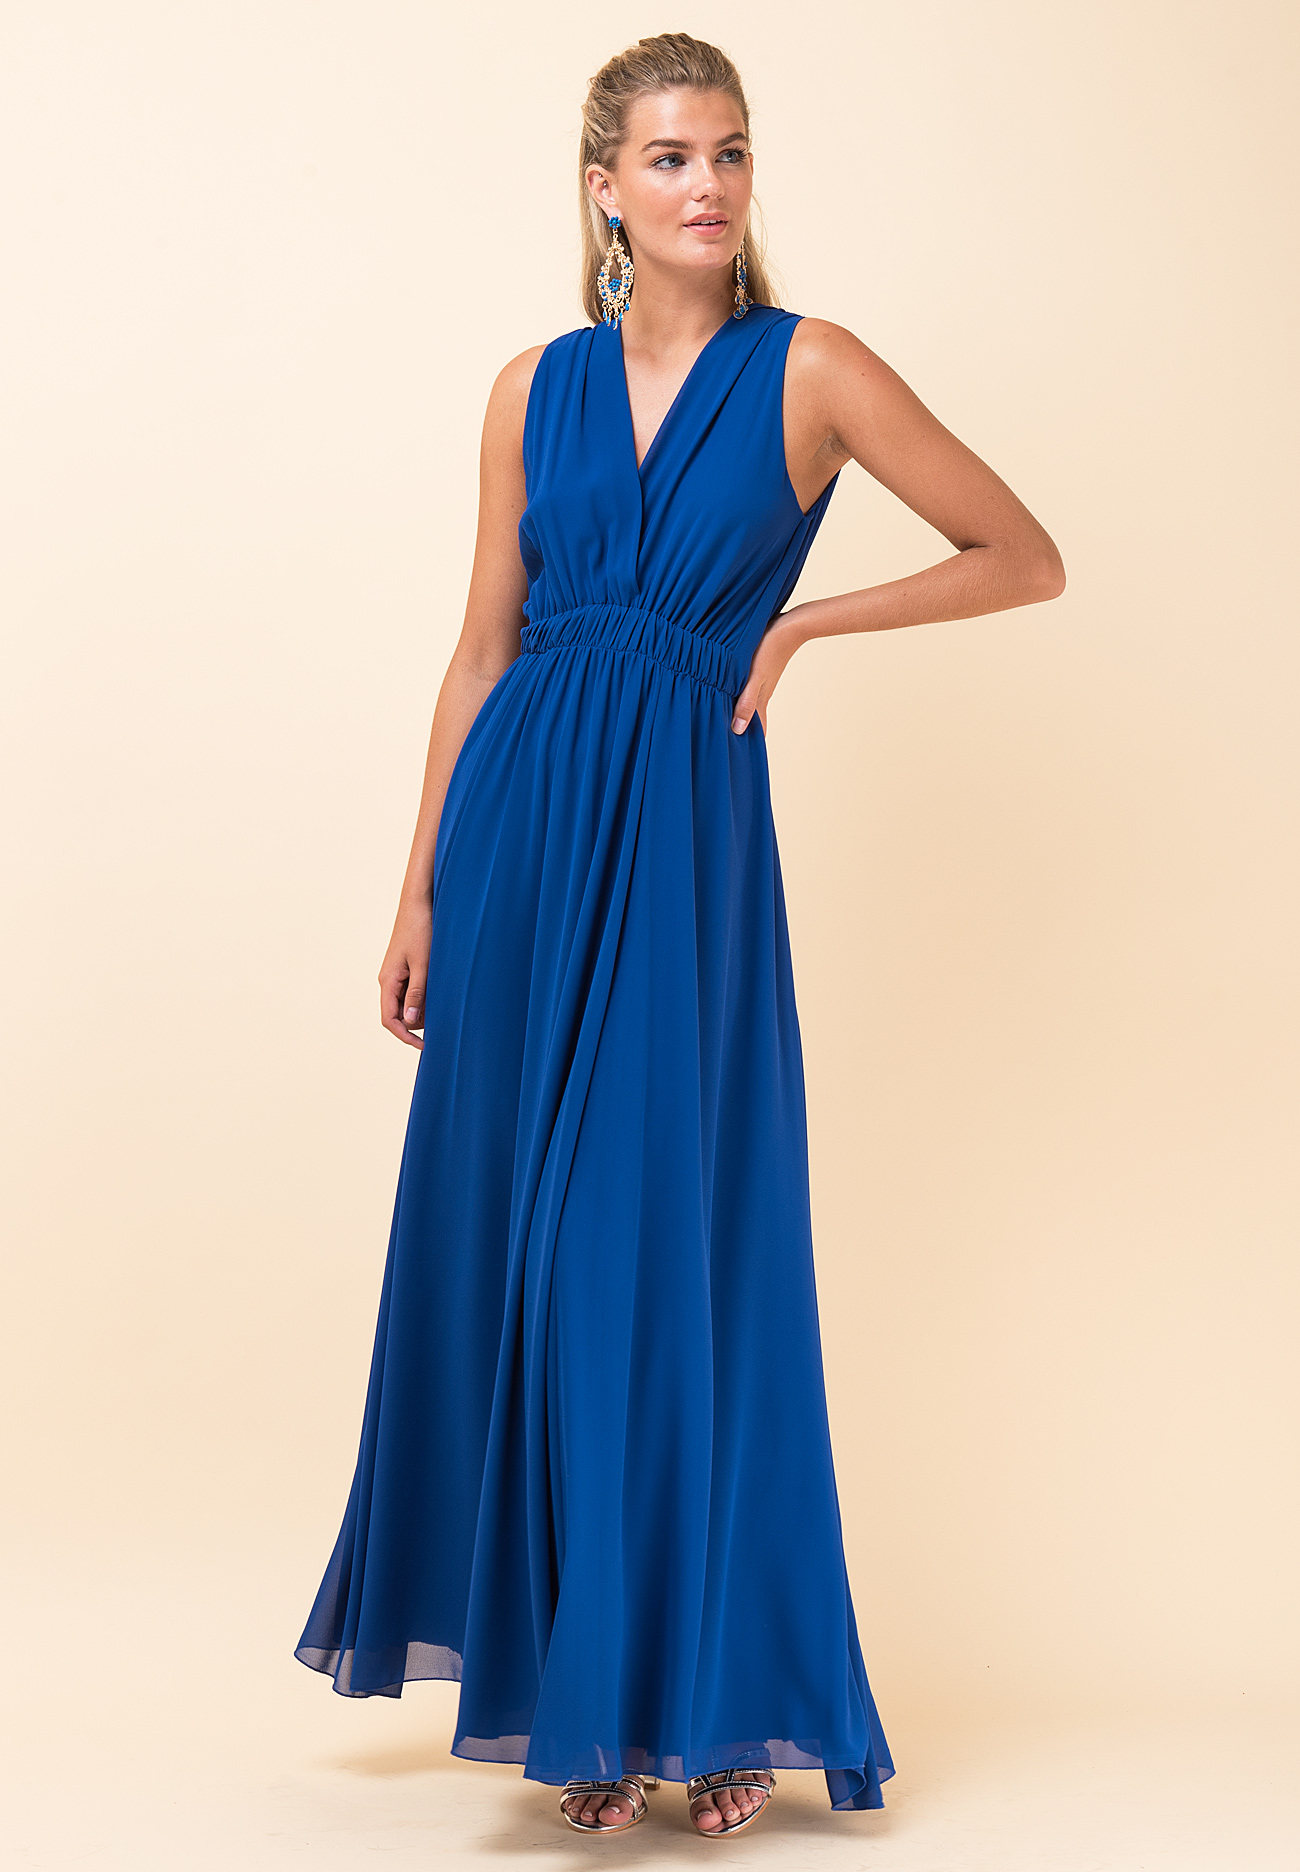 795698545018 Maxi μονόχρωμο φόρεμα με λάστιχο στη μέση